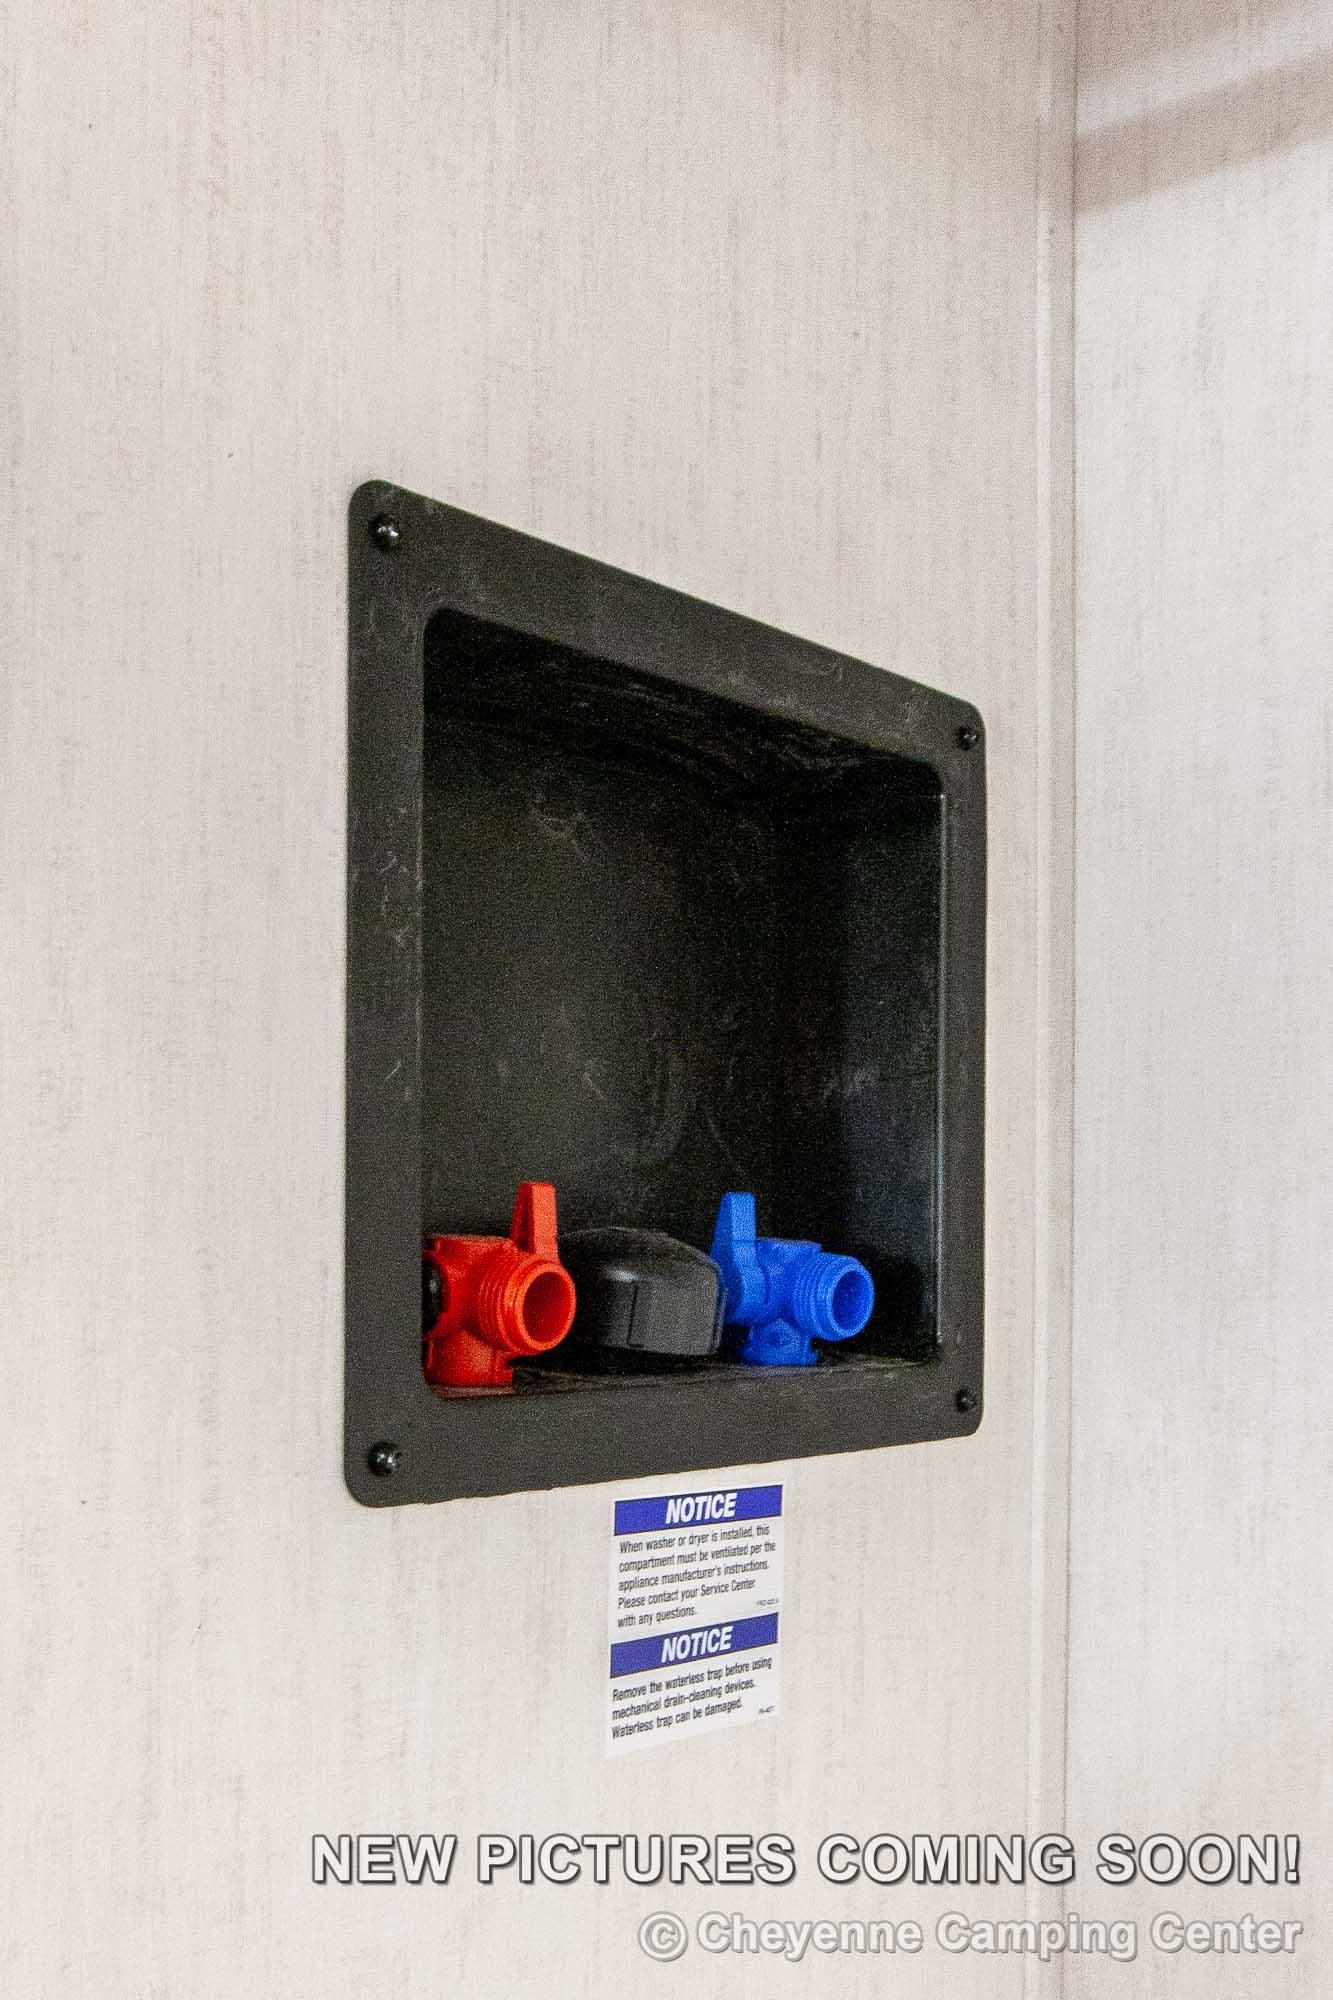 2022 Forest River Sabre Cobalt Edition 37FLL Bunkhouse Fifth Wheel Interior Image